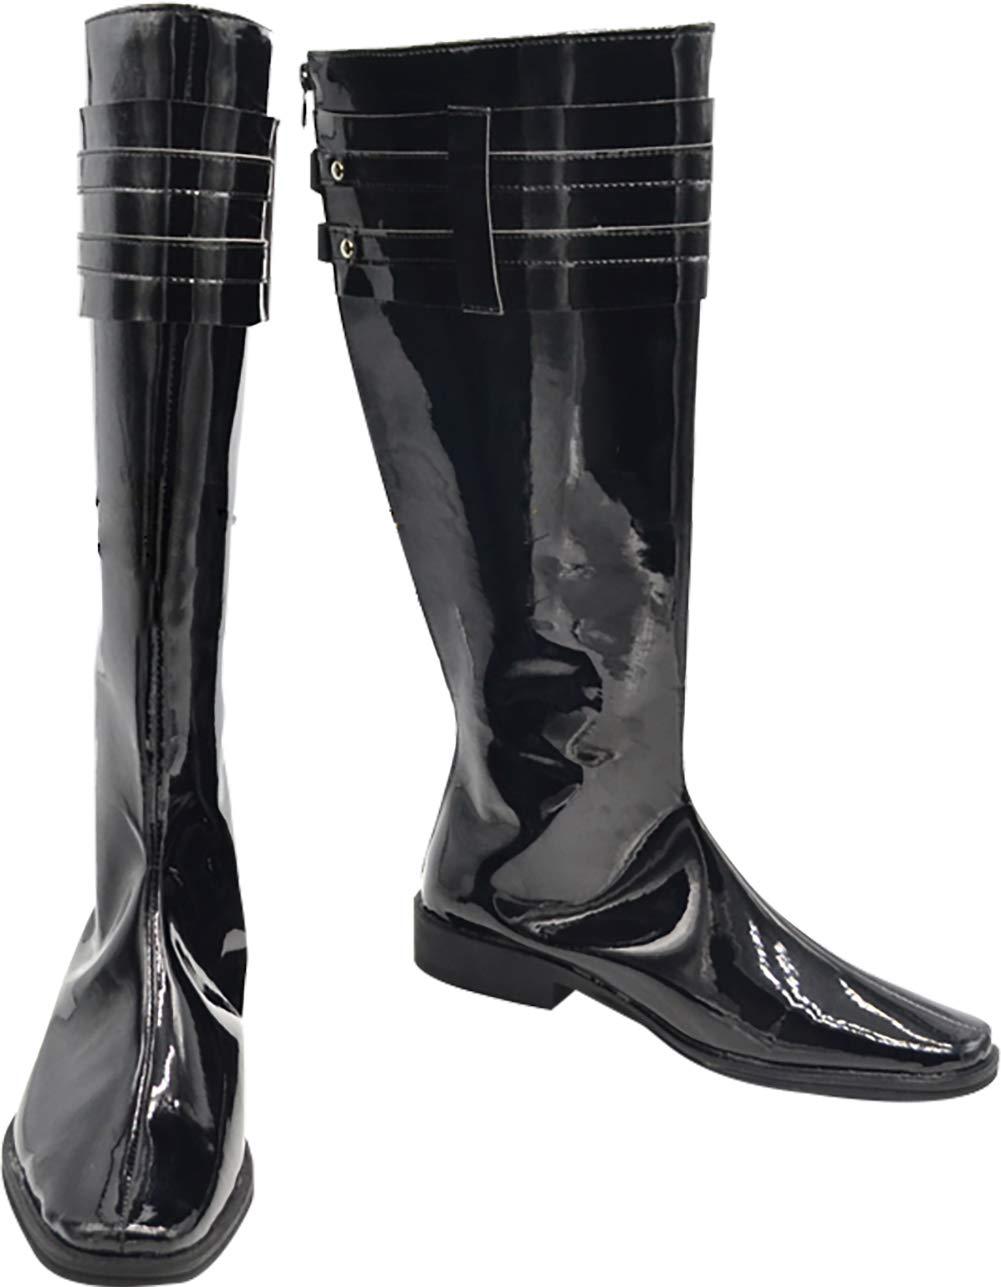 GSFDHDJS Cosplay Boots shoes for Touken Ranbu Nikkari Aoe